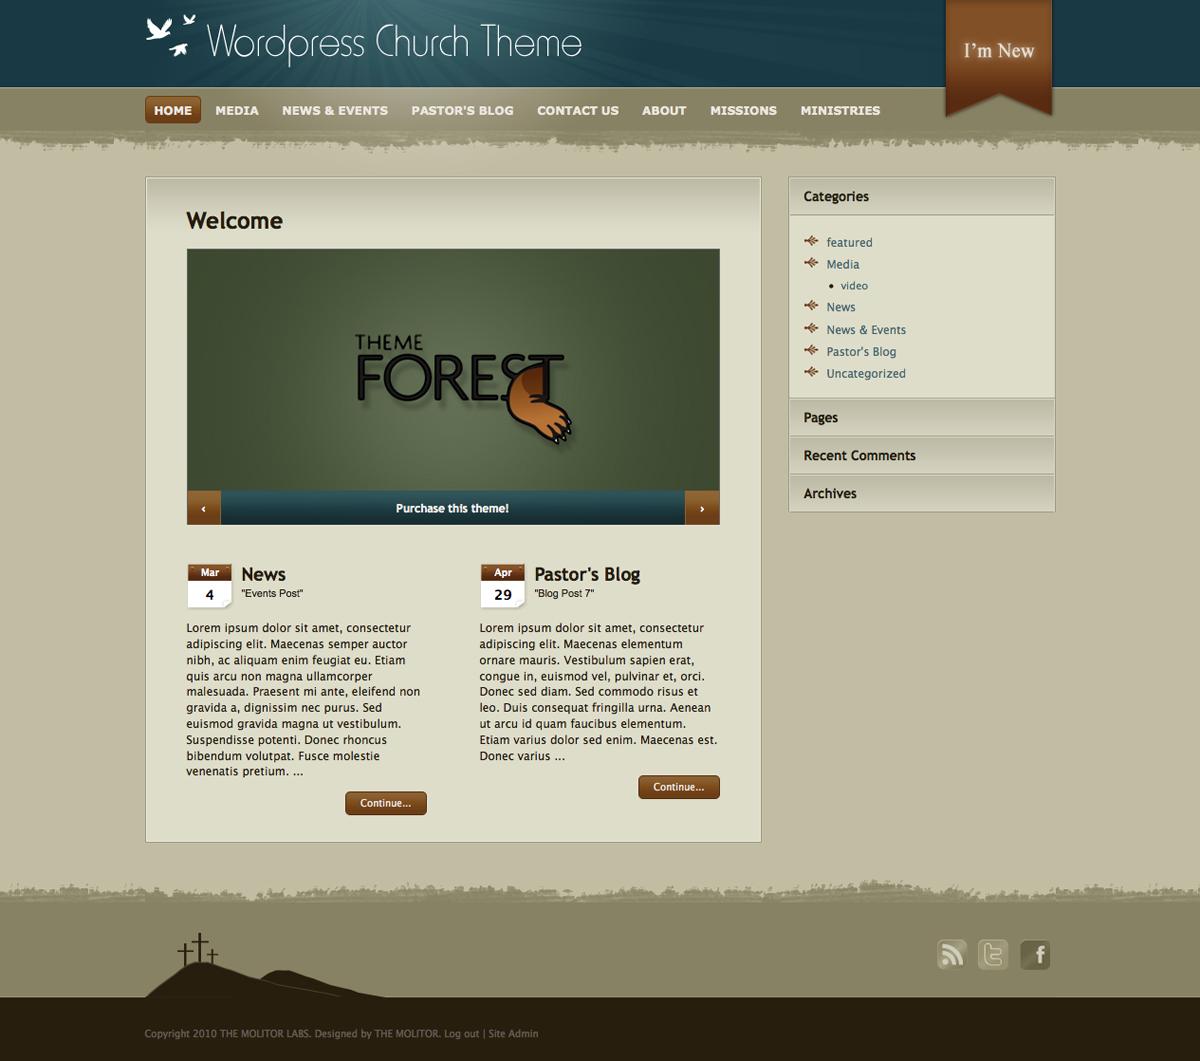 Church: WordPress Theme for Online Ministry